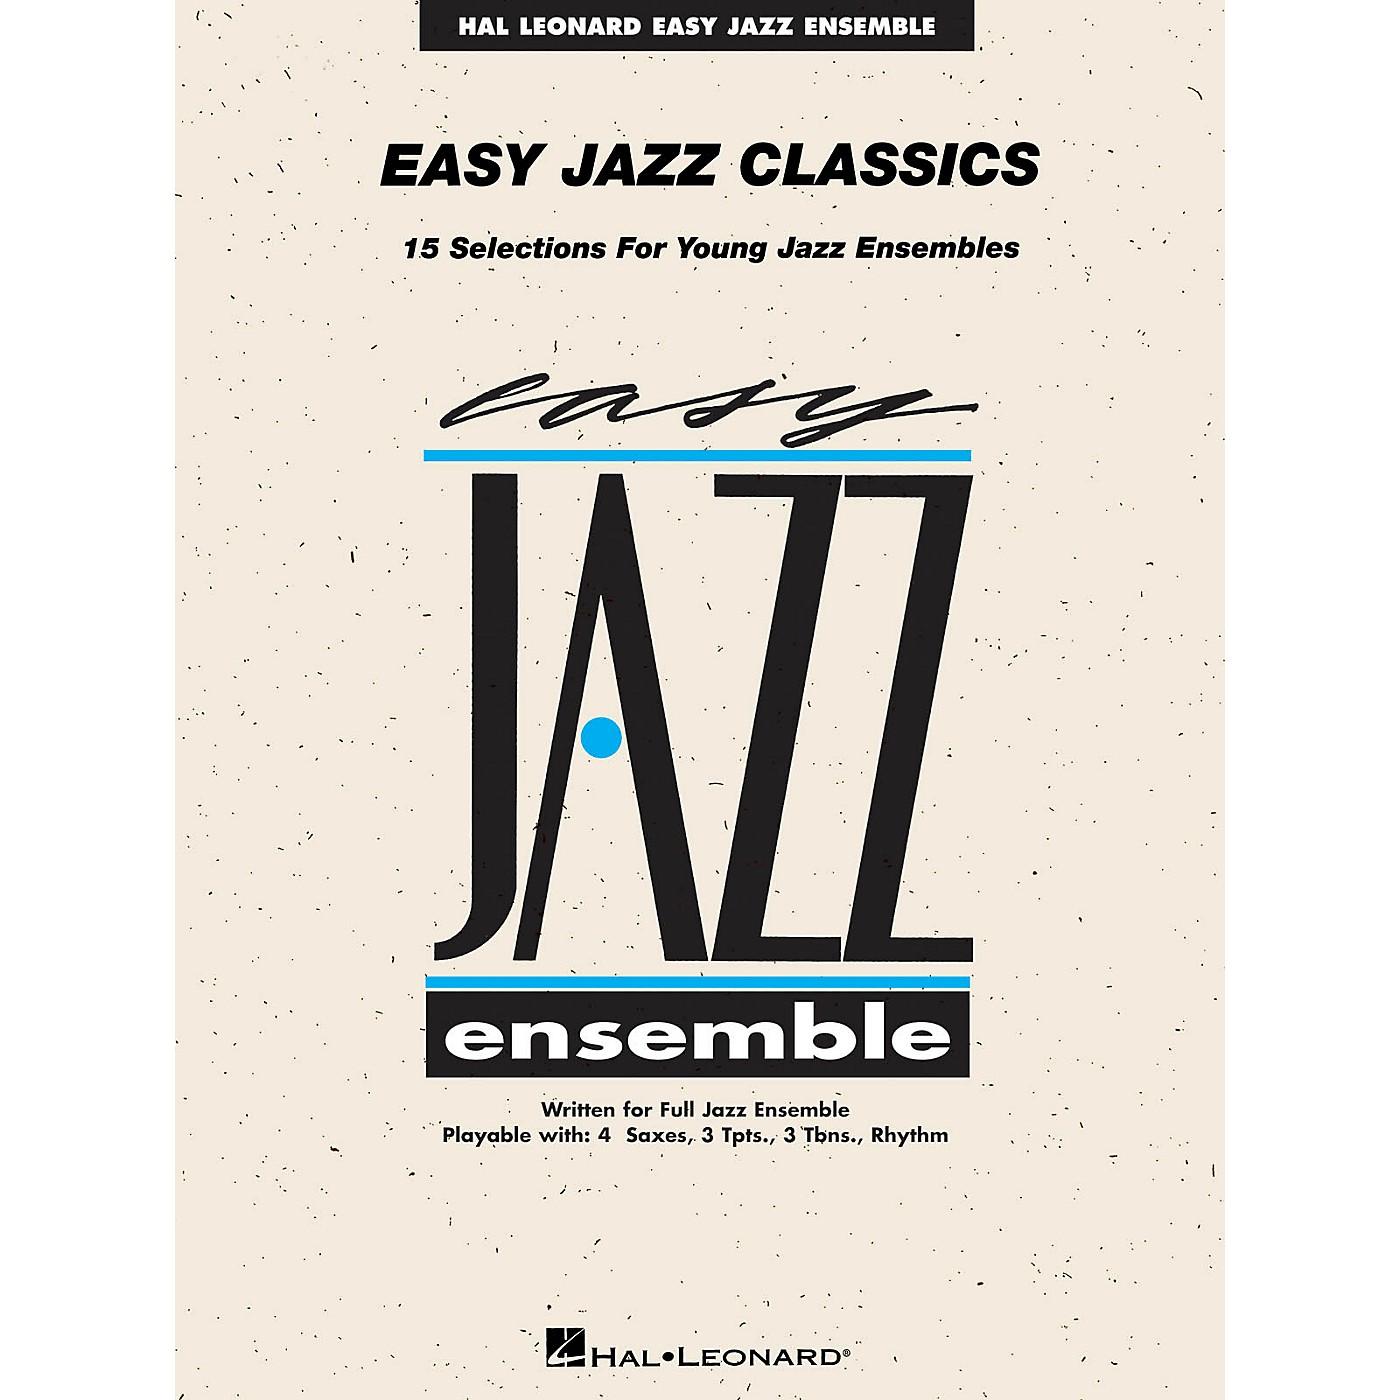 Hal Leonard Easy Jazz Classics - Trombone 4 Jazz Band Level 2 thumbnail